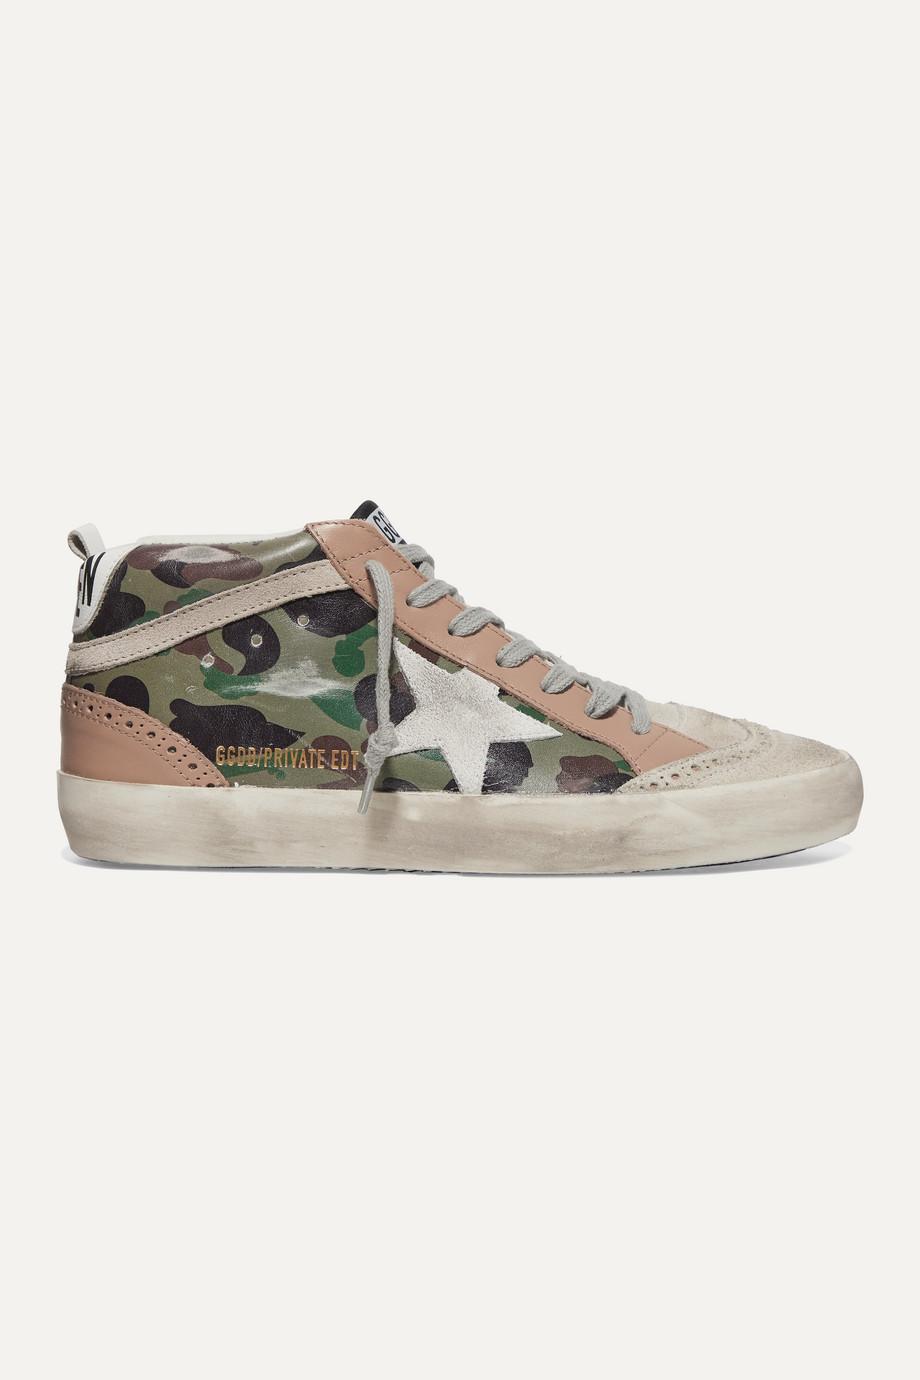 Golden Goose Mid Star Sneakers aus Leder und Veloursleder mit Camouflage-Print in Distressed-Optik